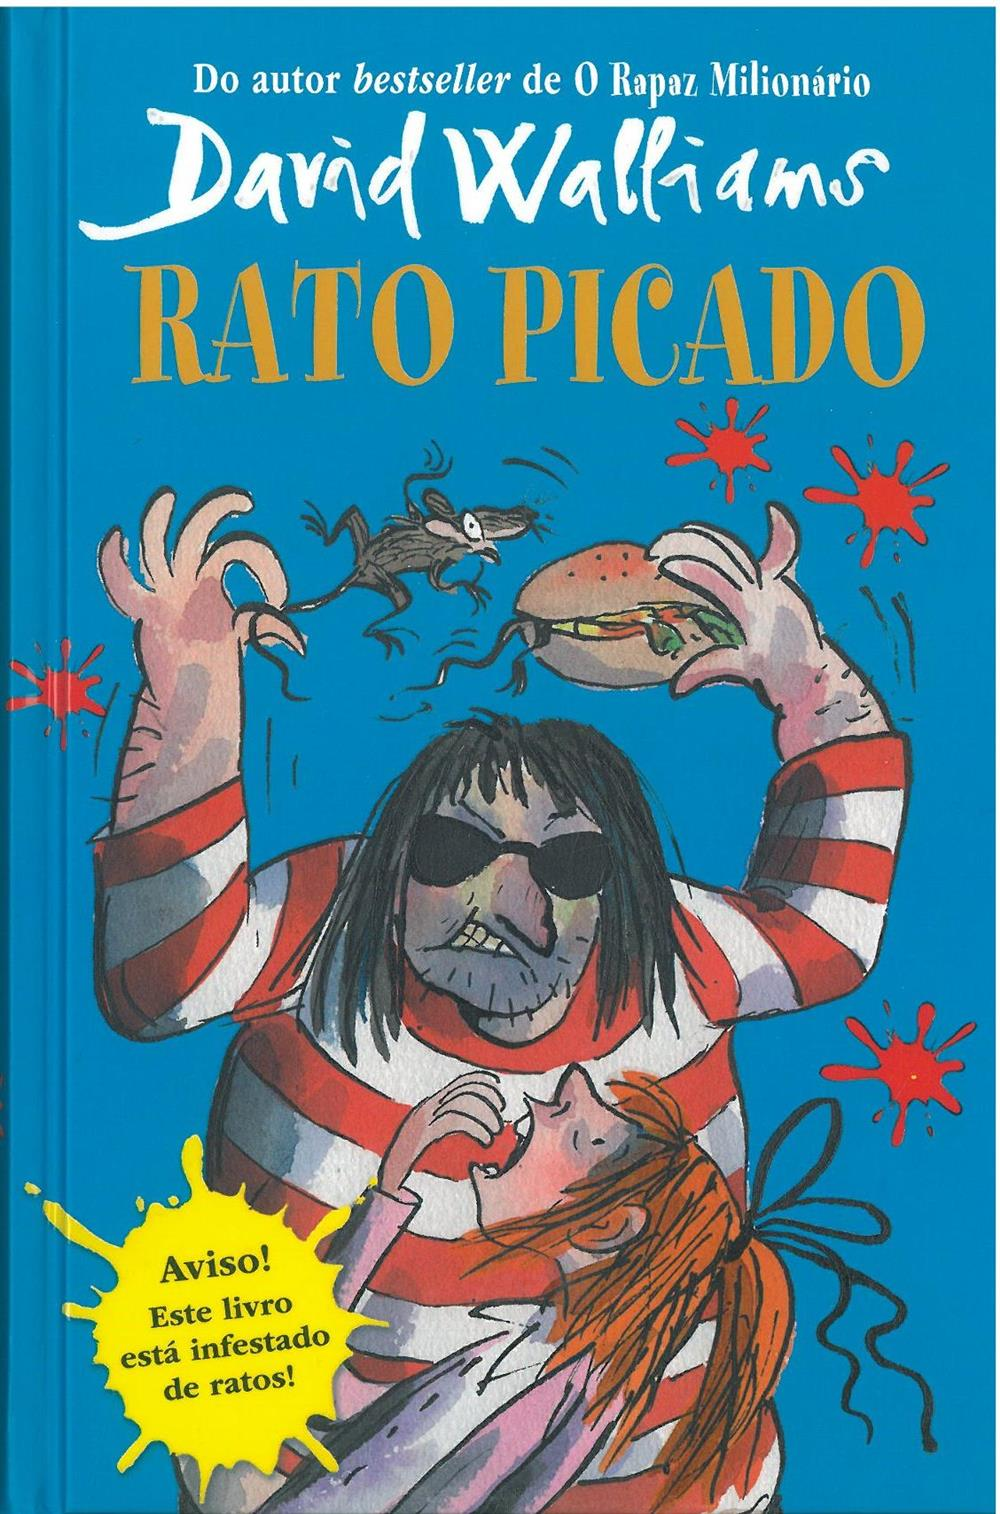 Rato picado_.jpg